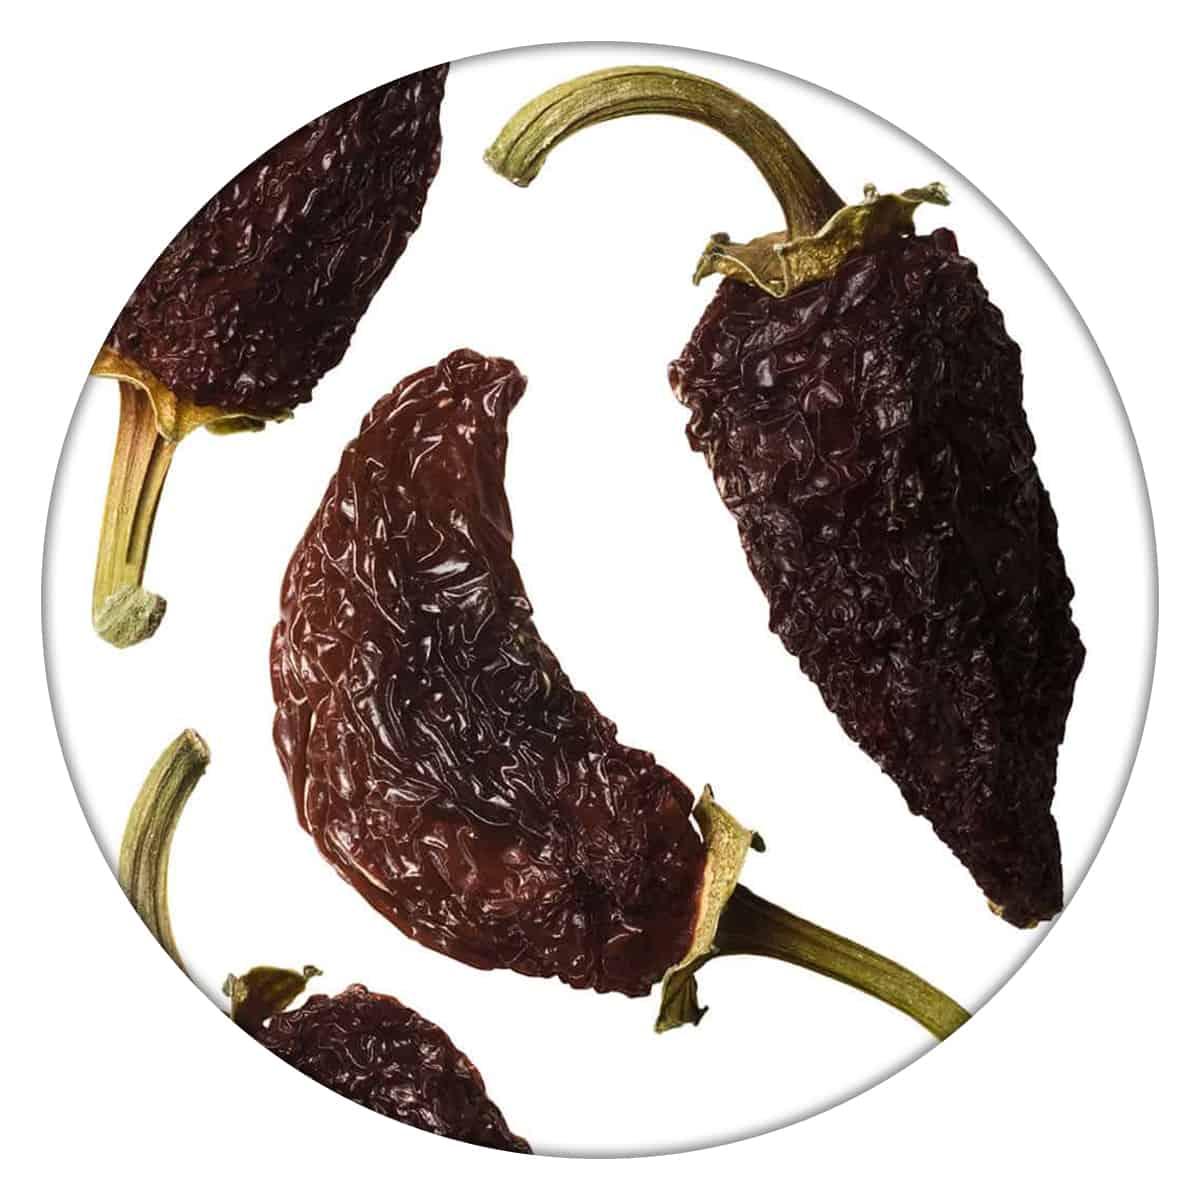 Buy IAG Foods Morita Chilli - 450 gm